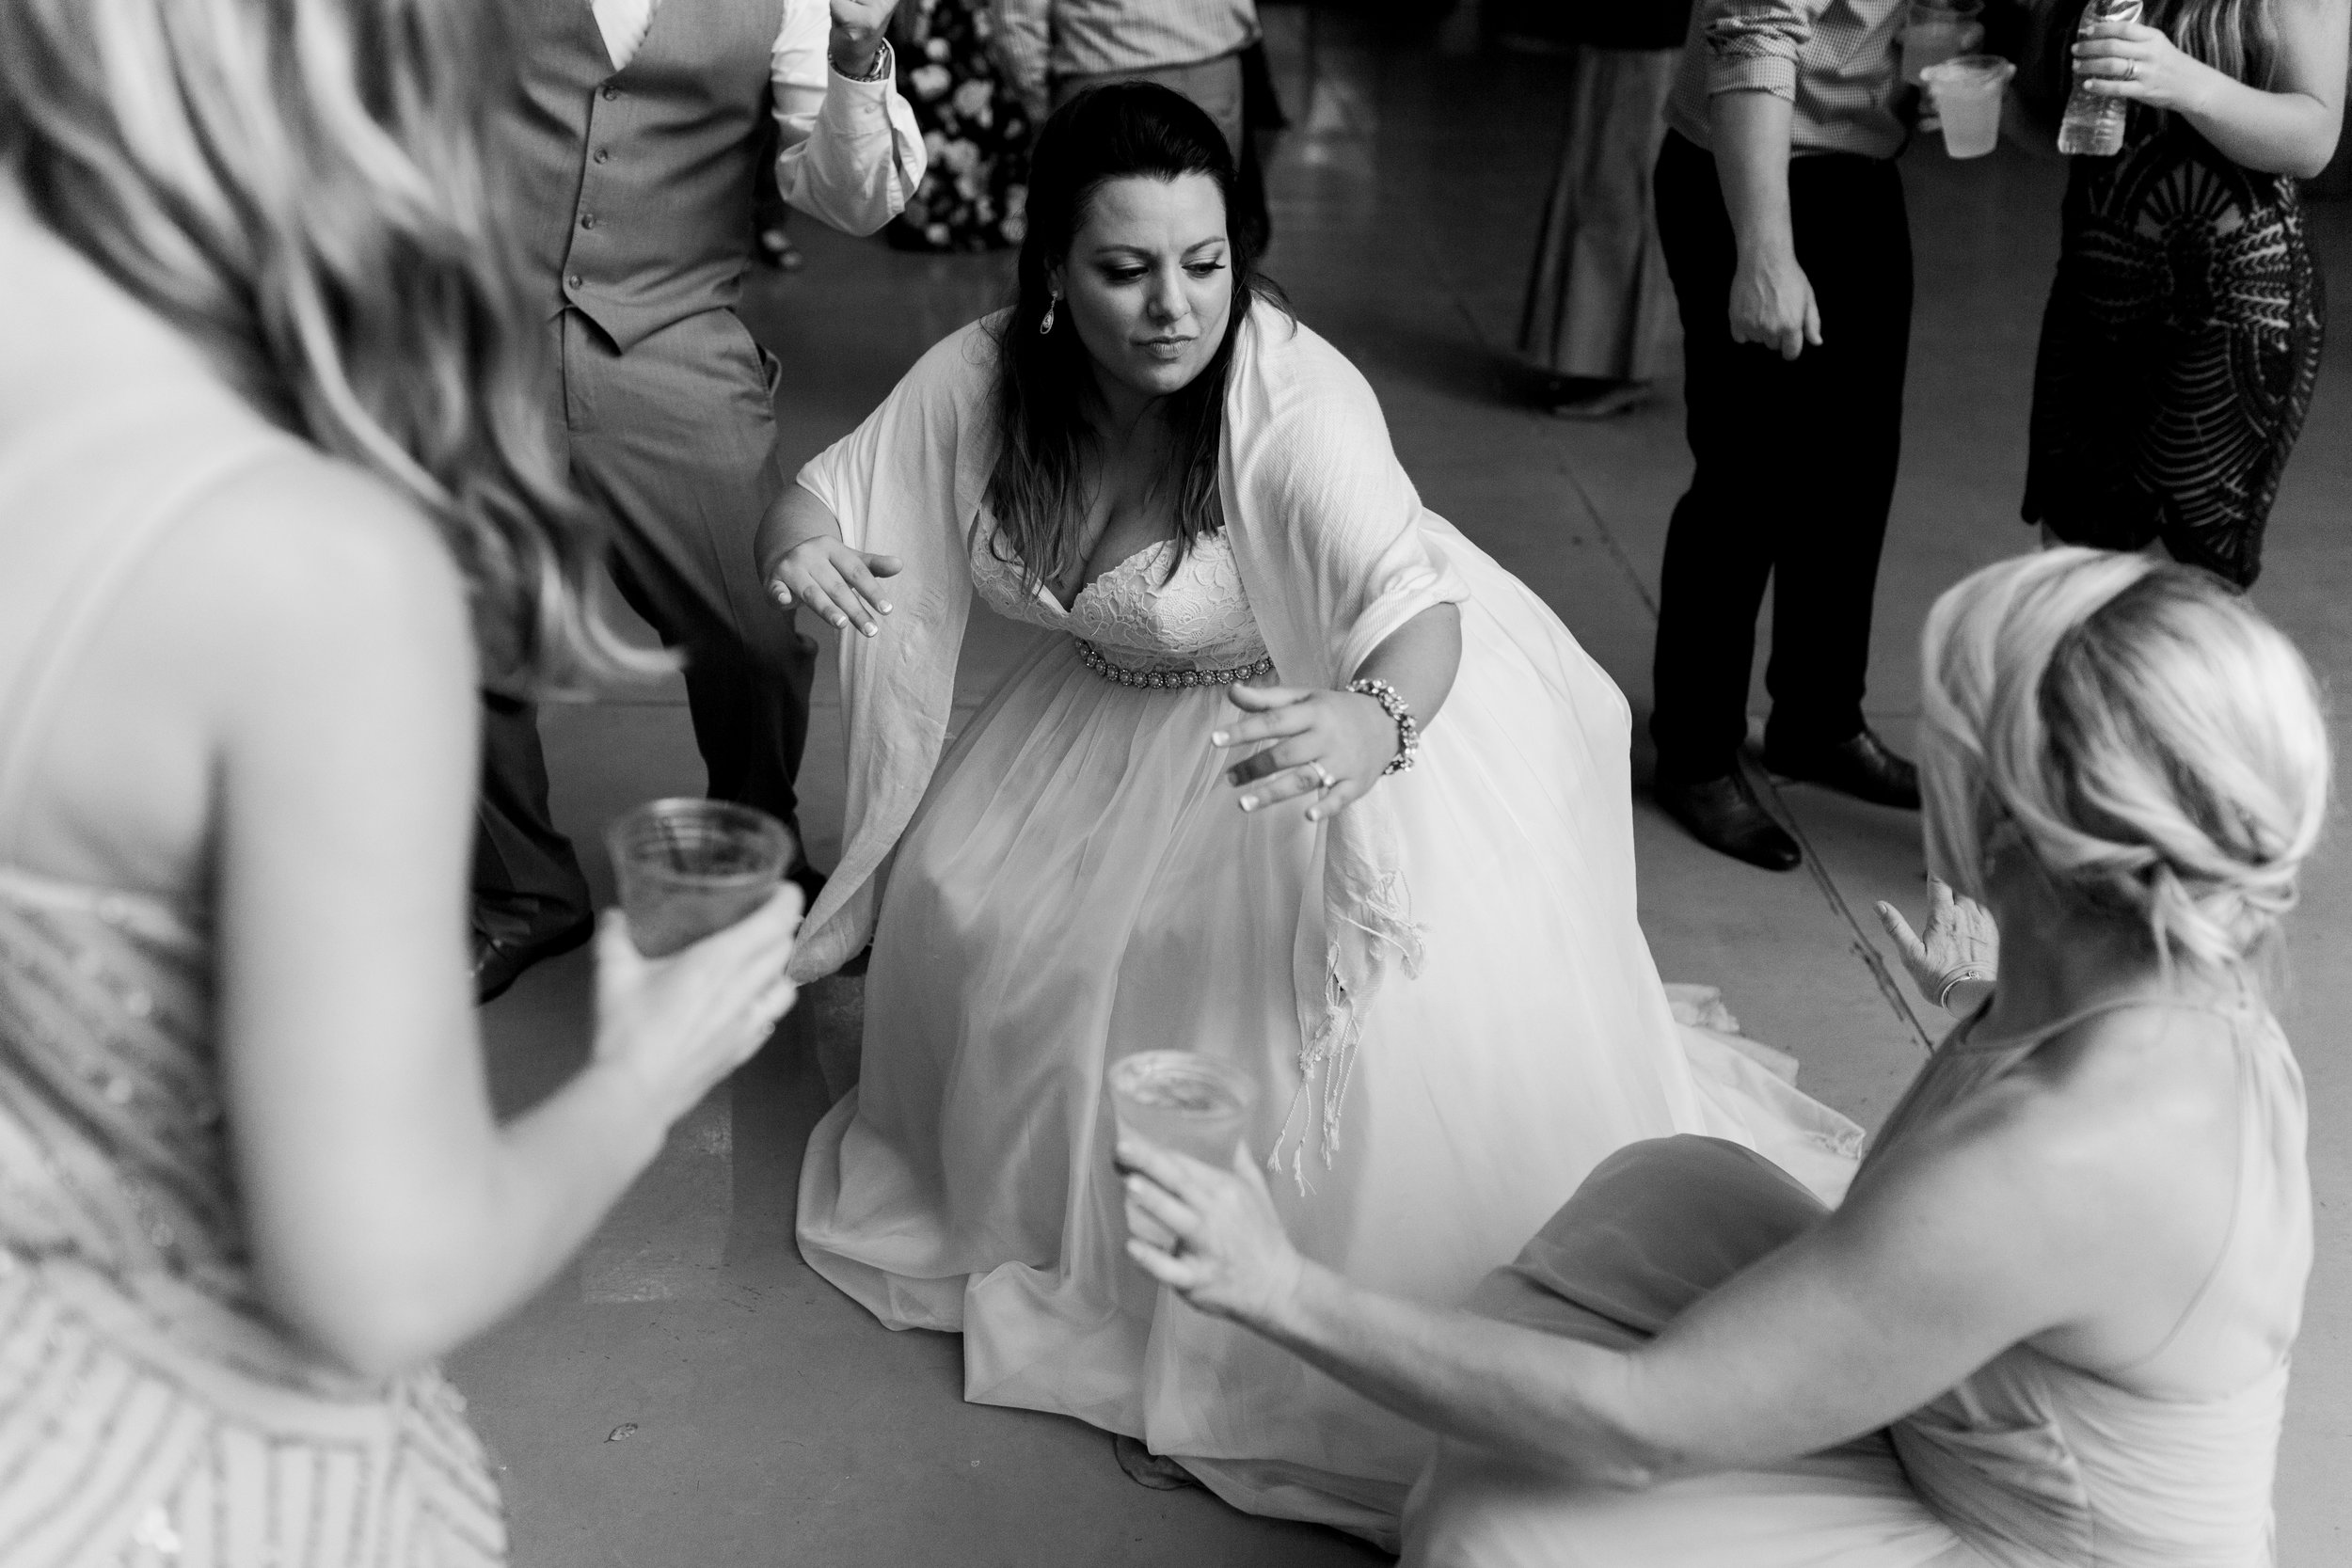 airport-hanger-wedding-at-attitude-aviation-in-livermore-139.jpg